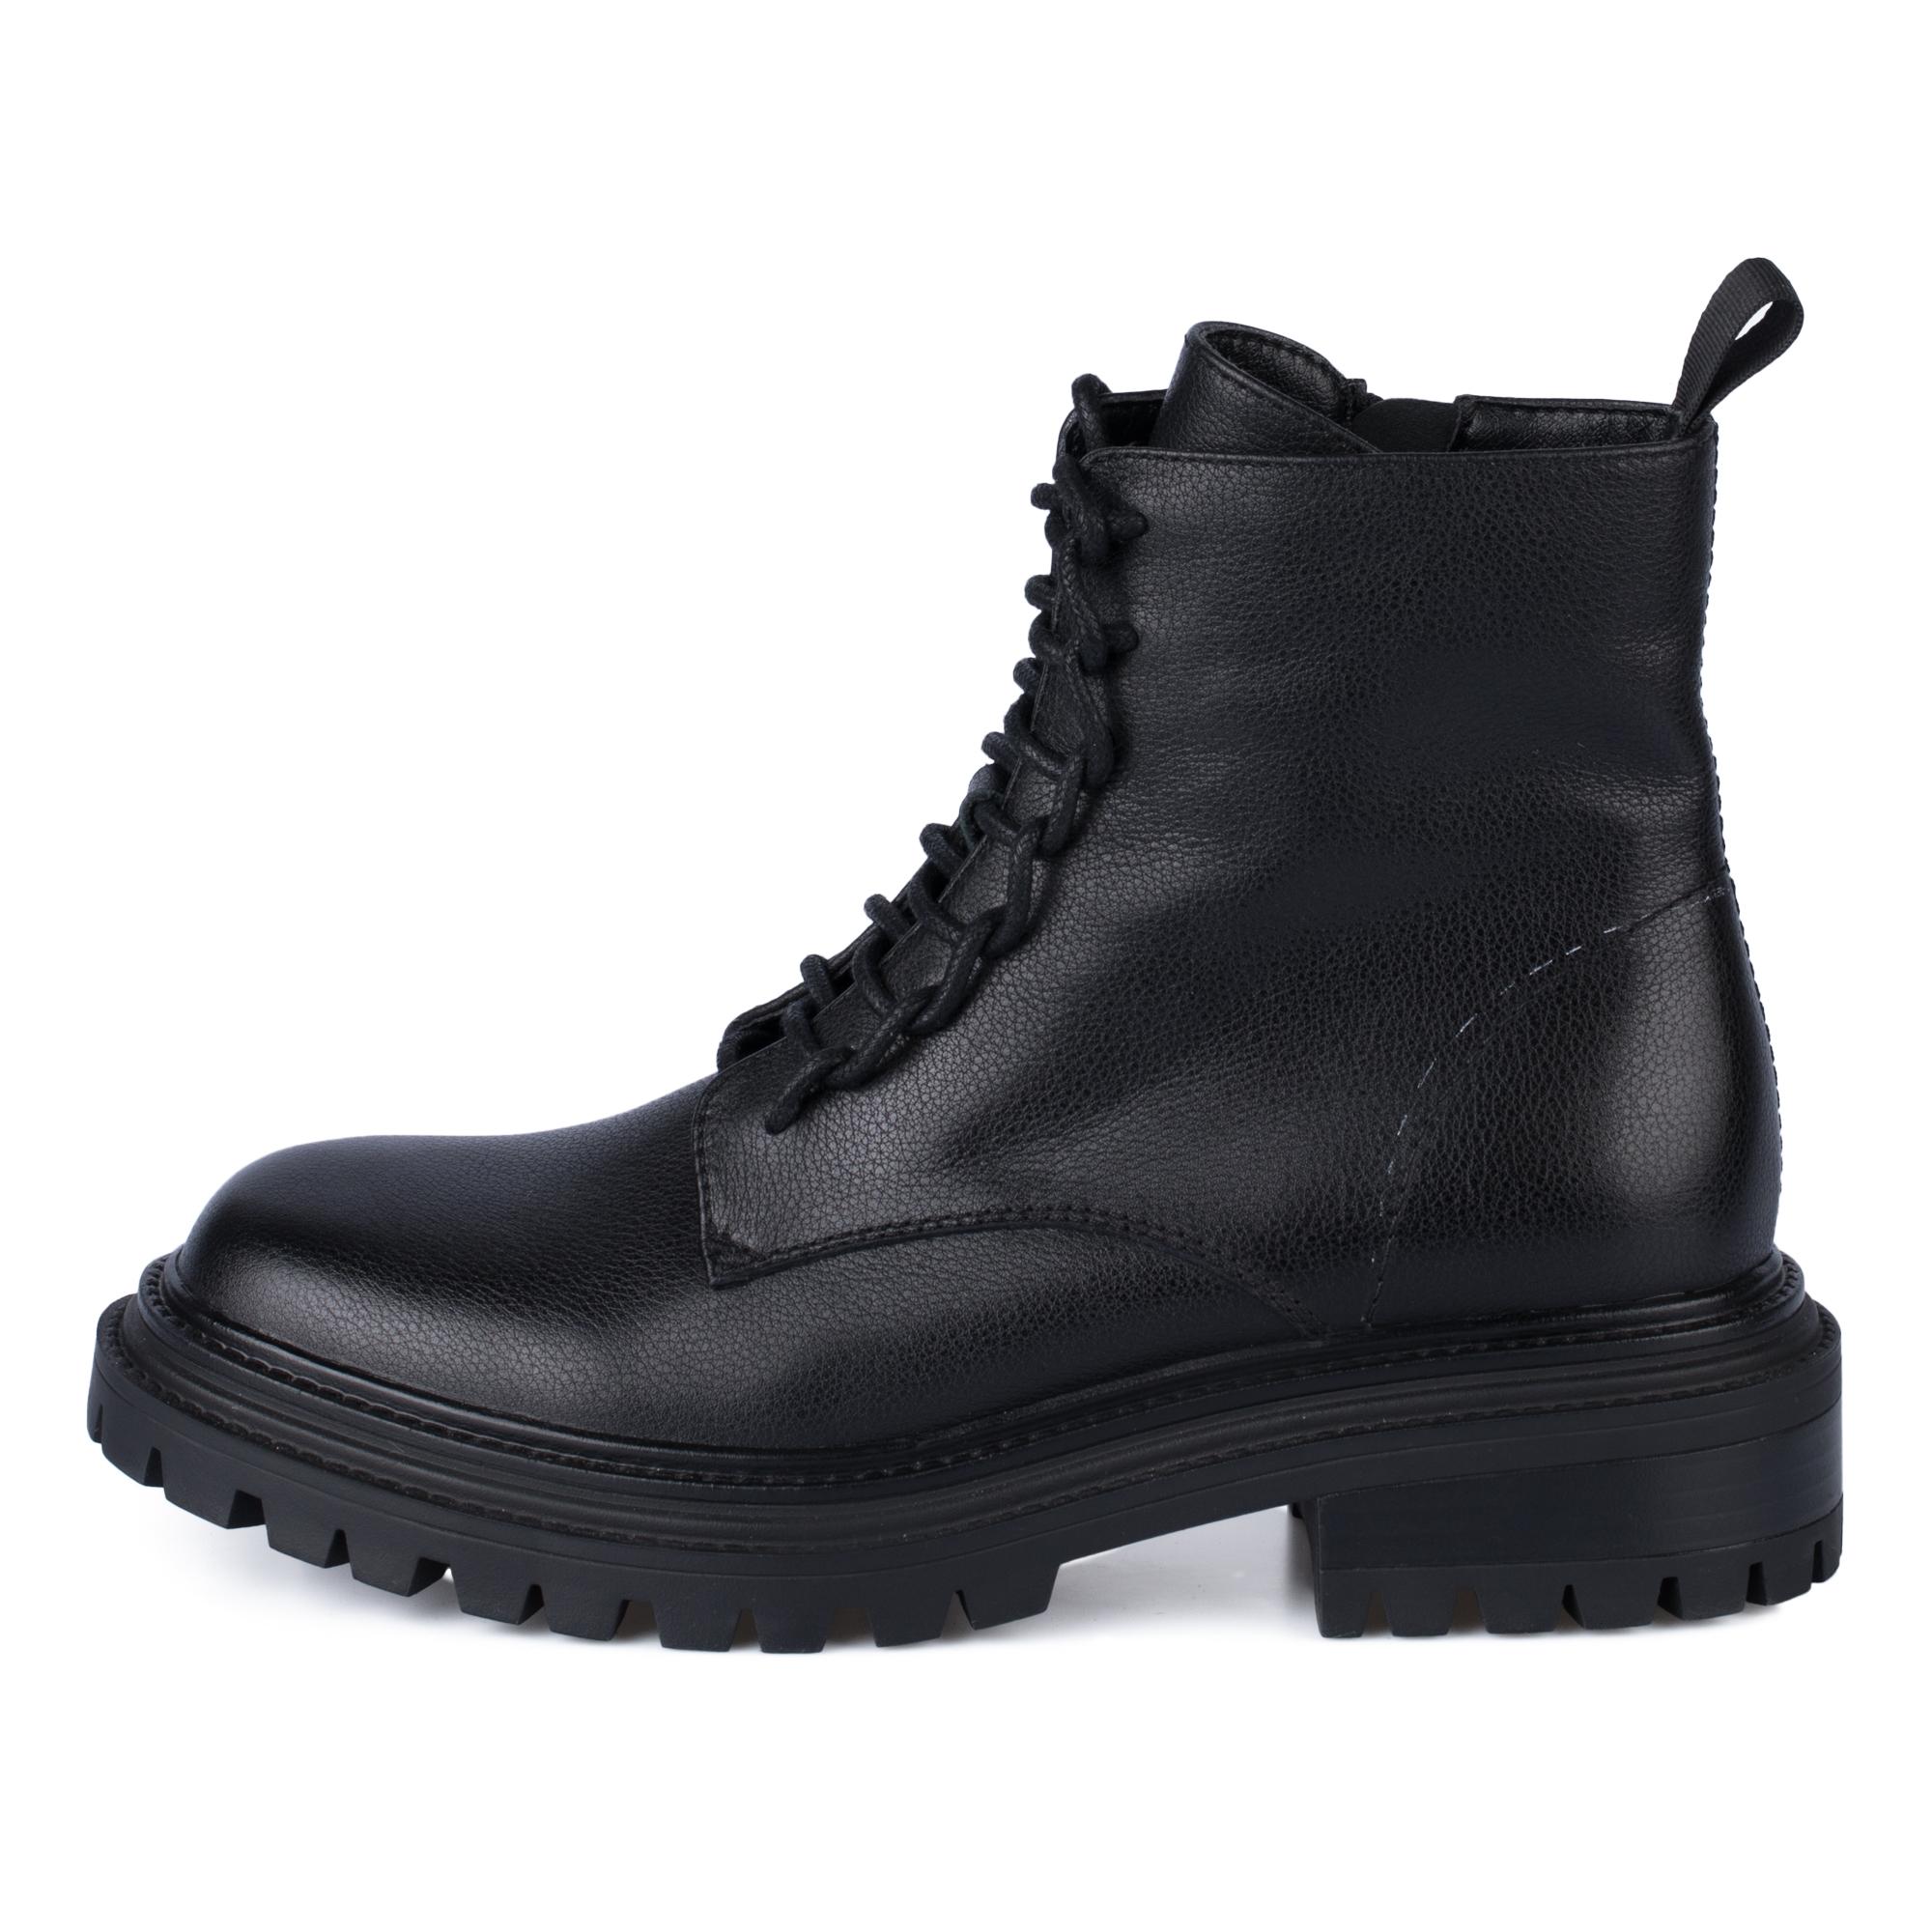 Ботинки Thomas Munz 233-958A-5102